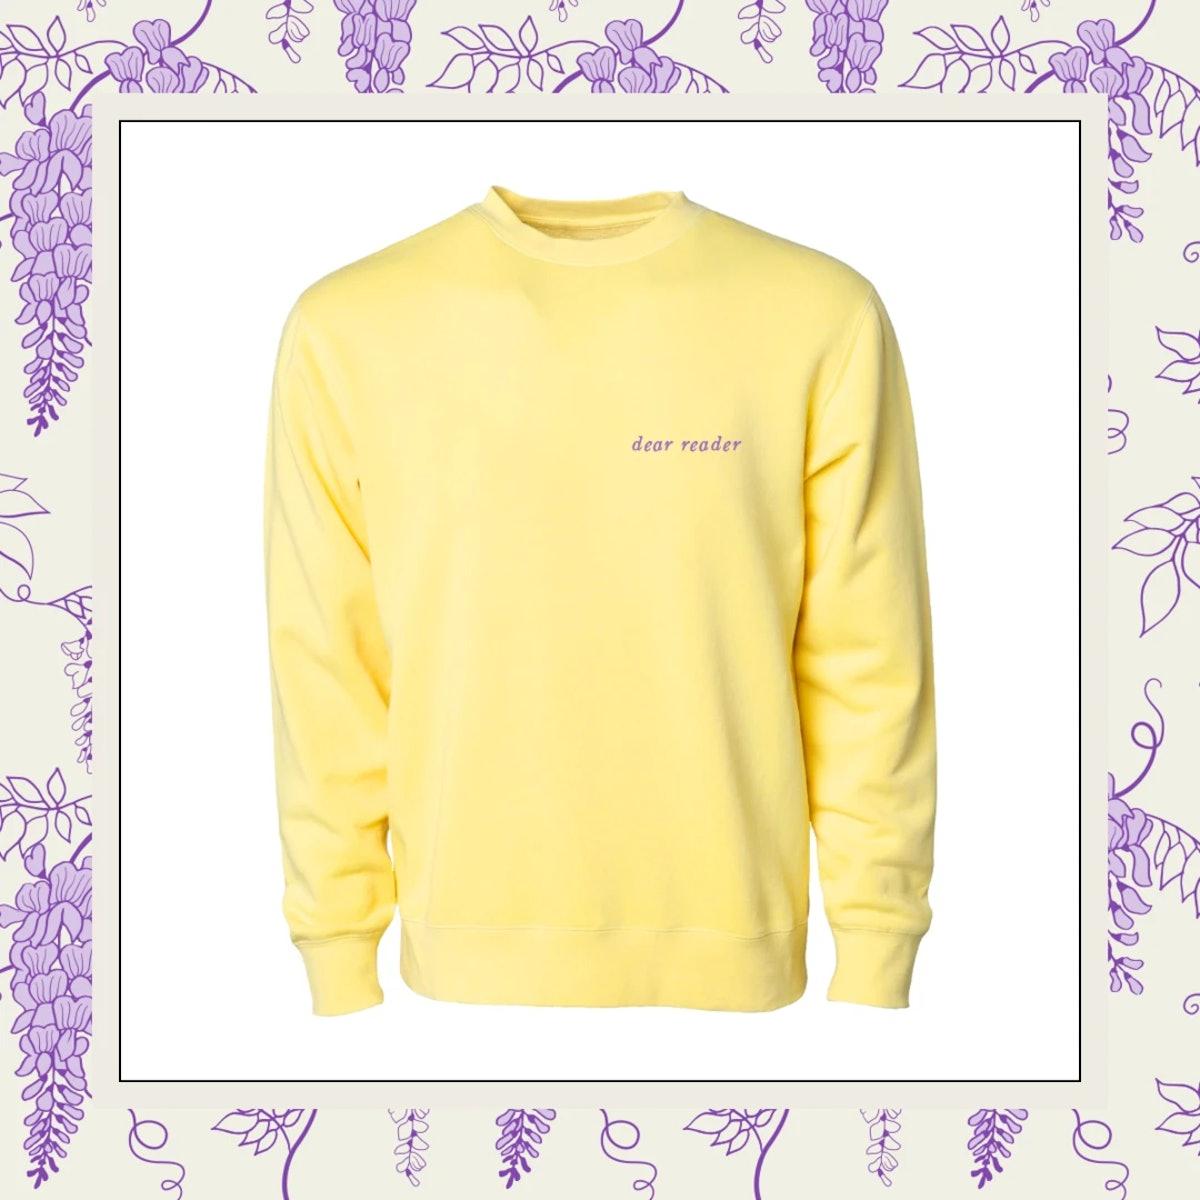 Phenomenal x Bridgerton Collab (Dear Reader) Crewneck Sweatshirt